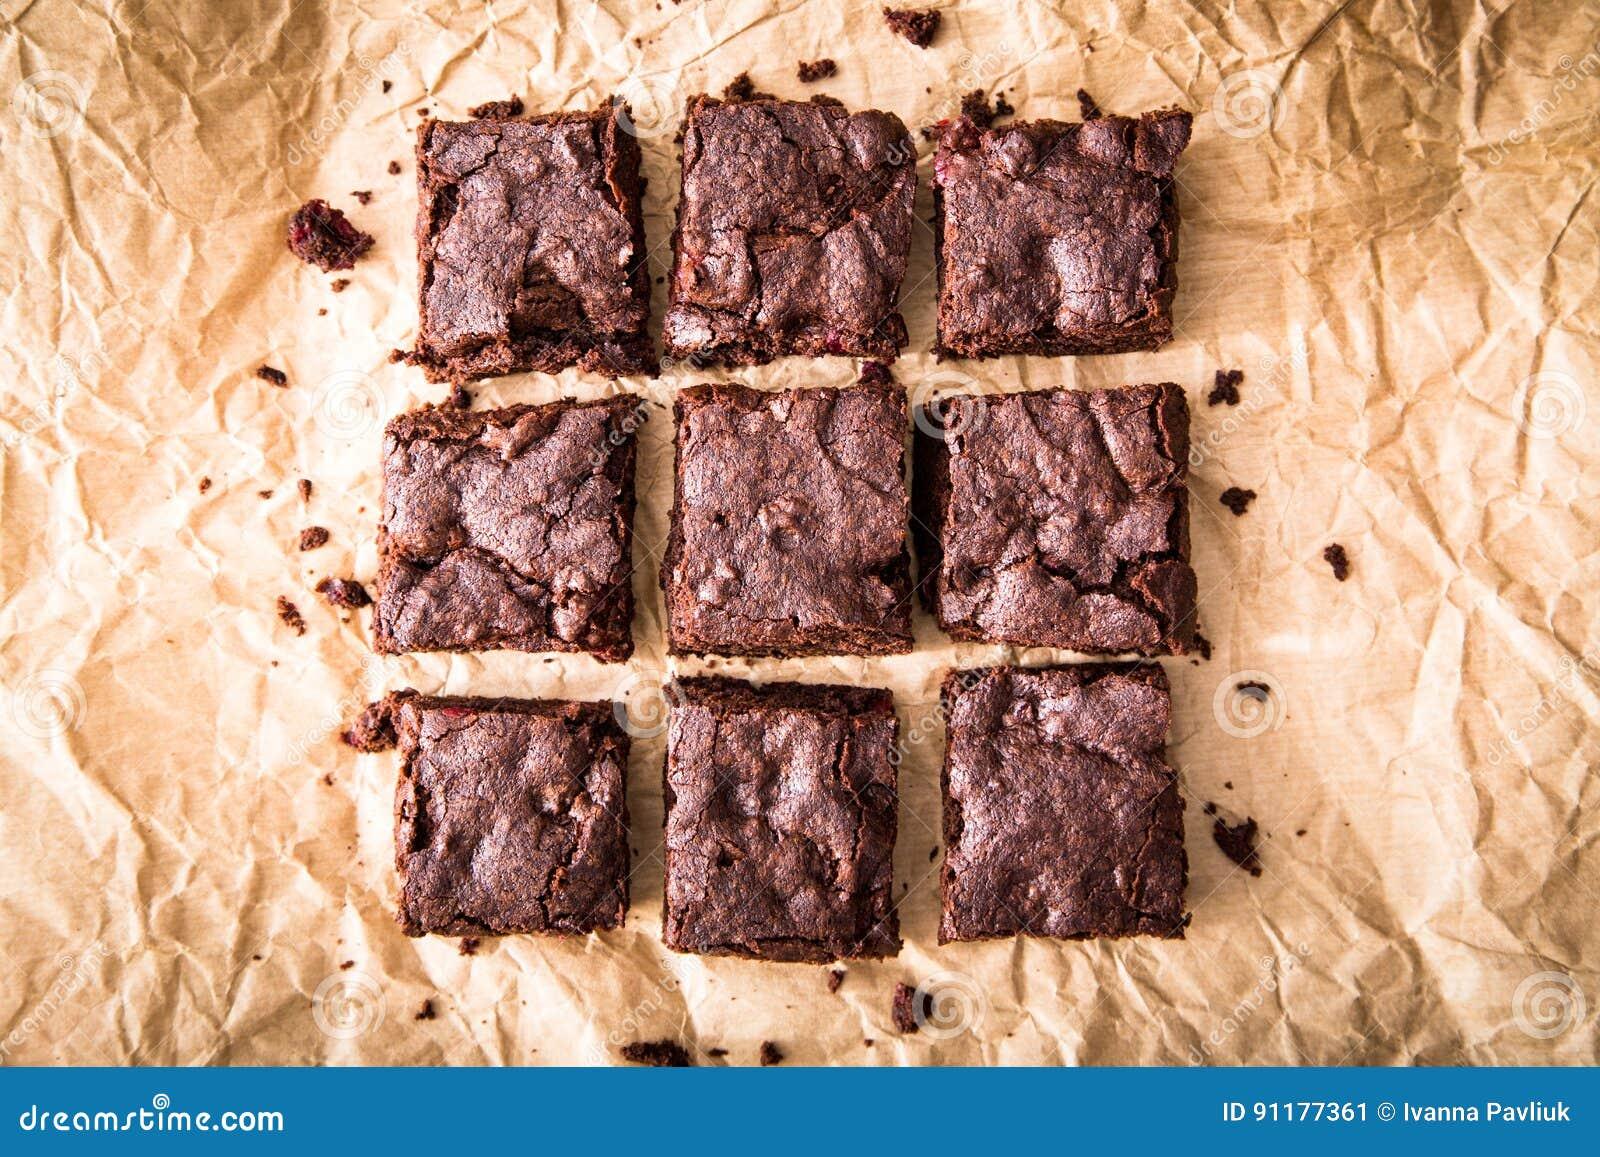 Homemade Delicious Chocolate Brownies. closeup chocolate cake